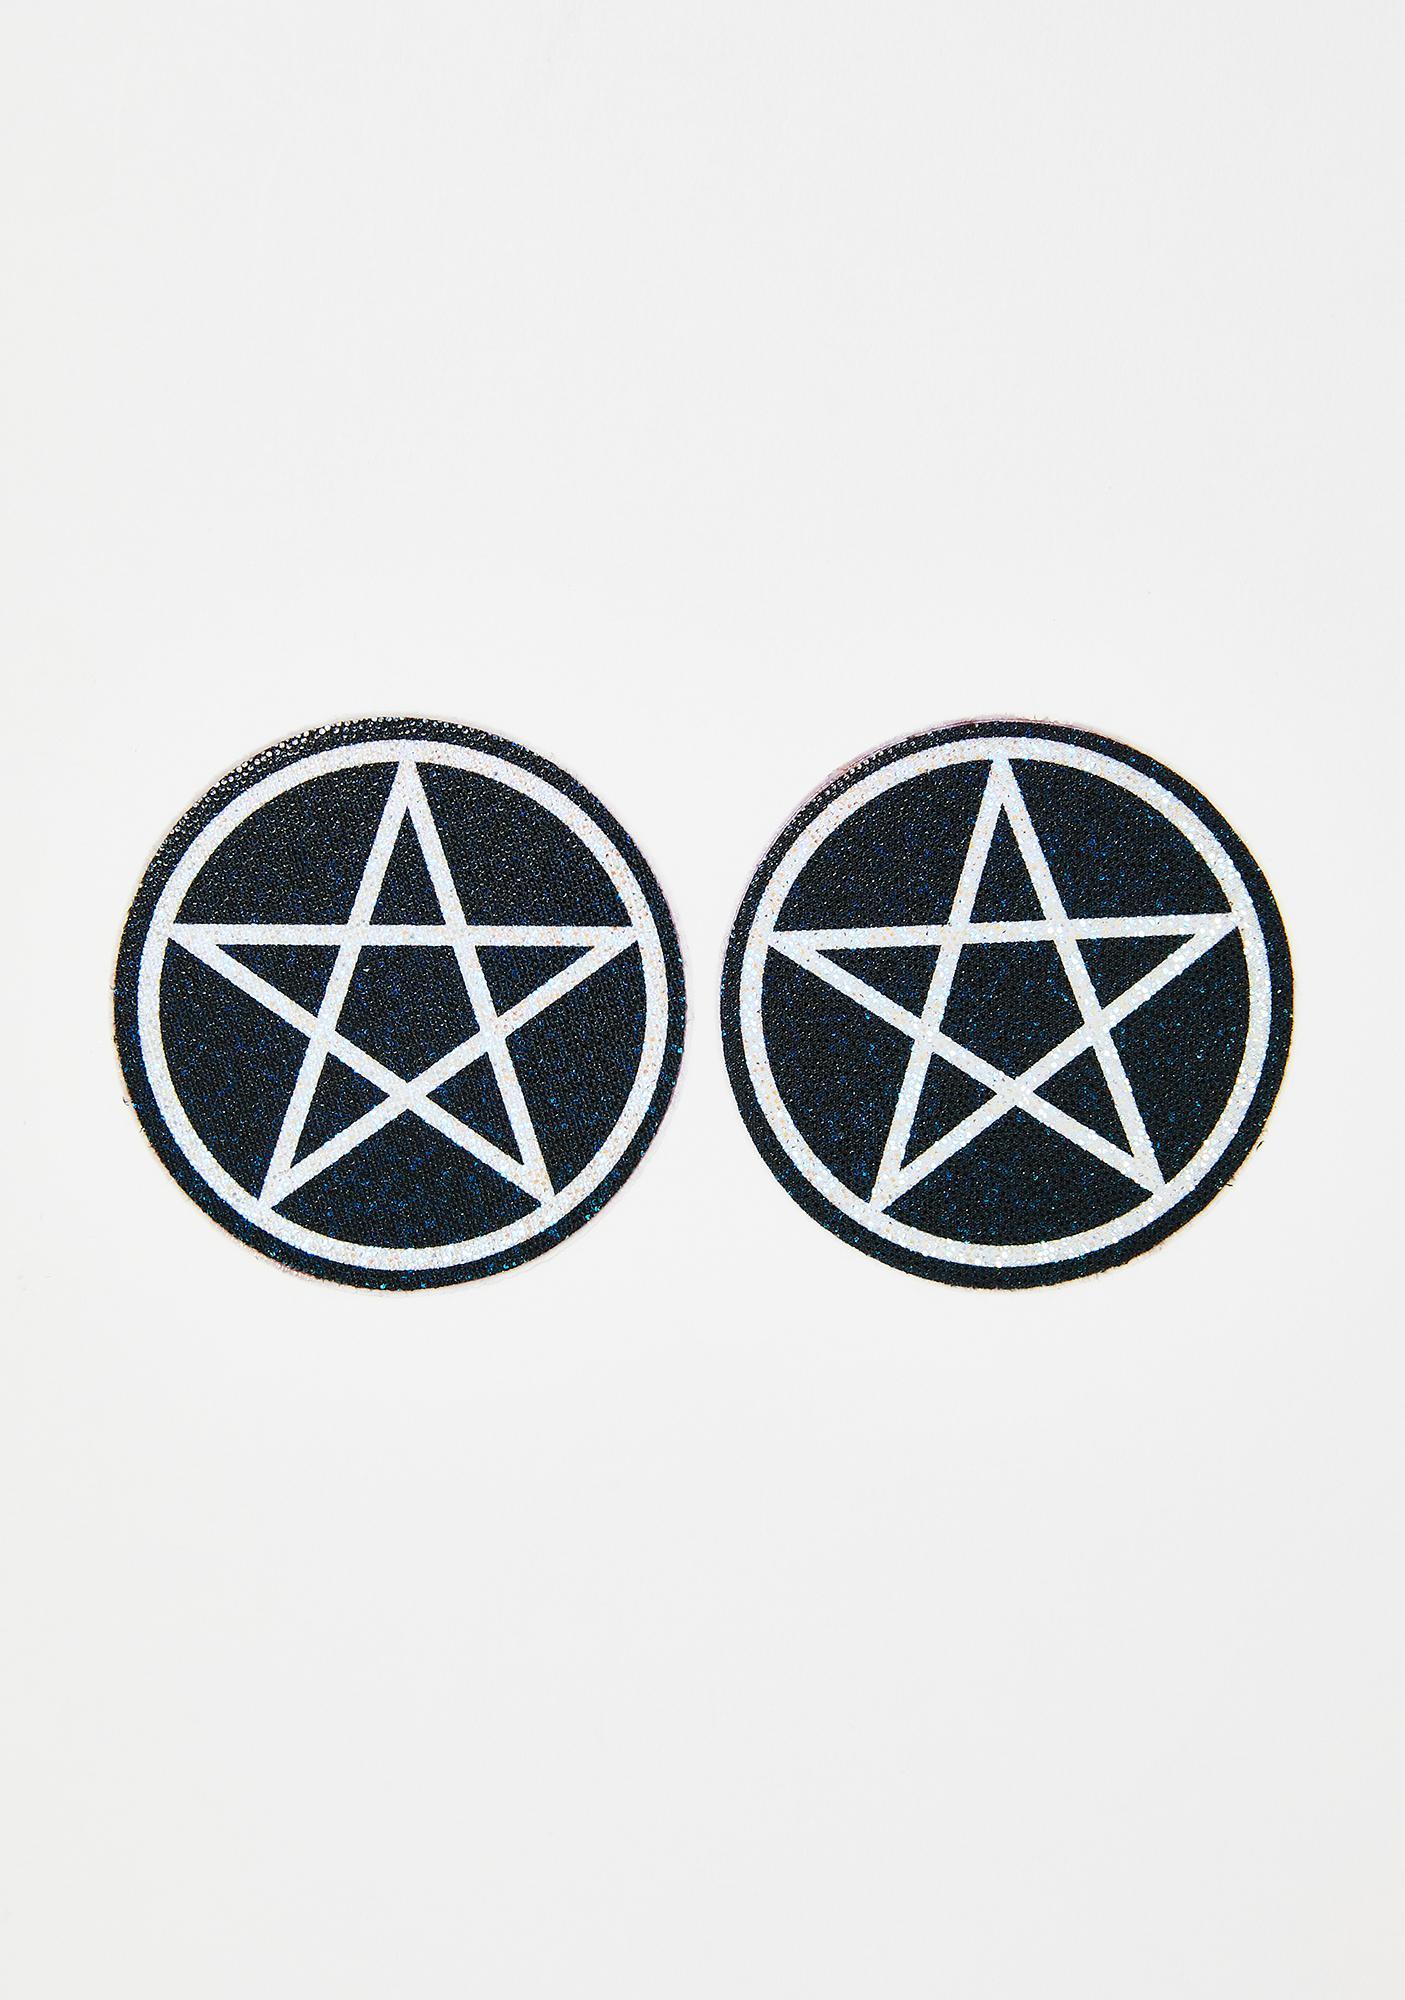 Pastease Glitter Pentagram Pasties